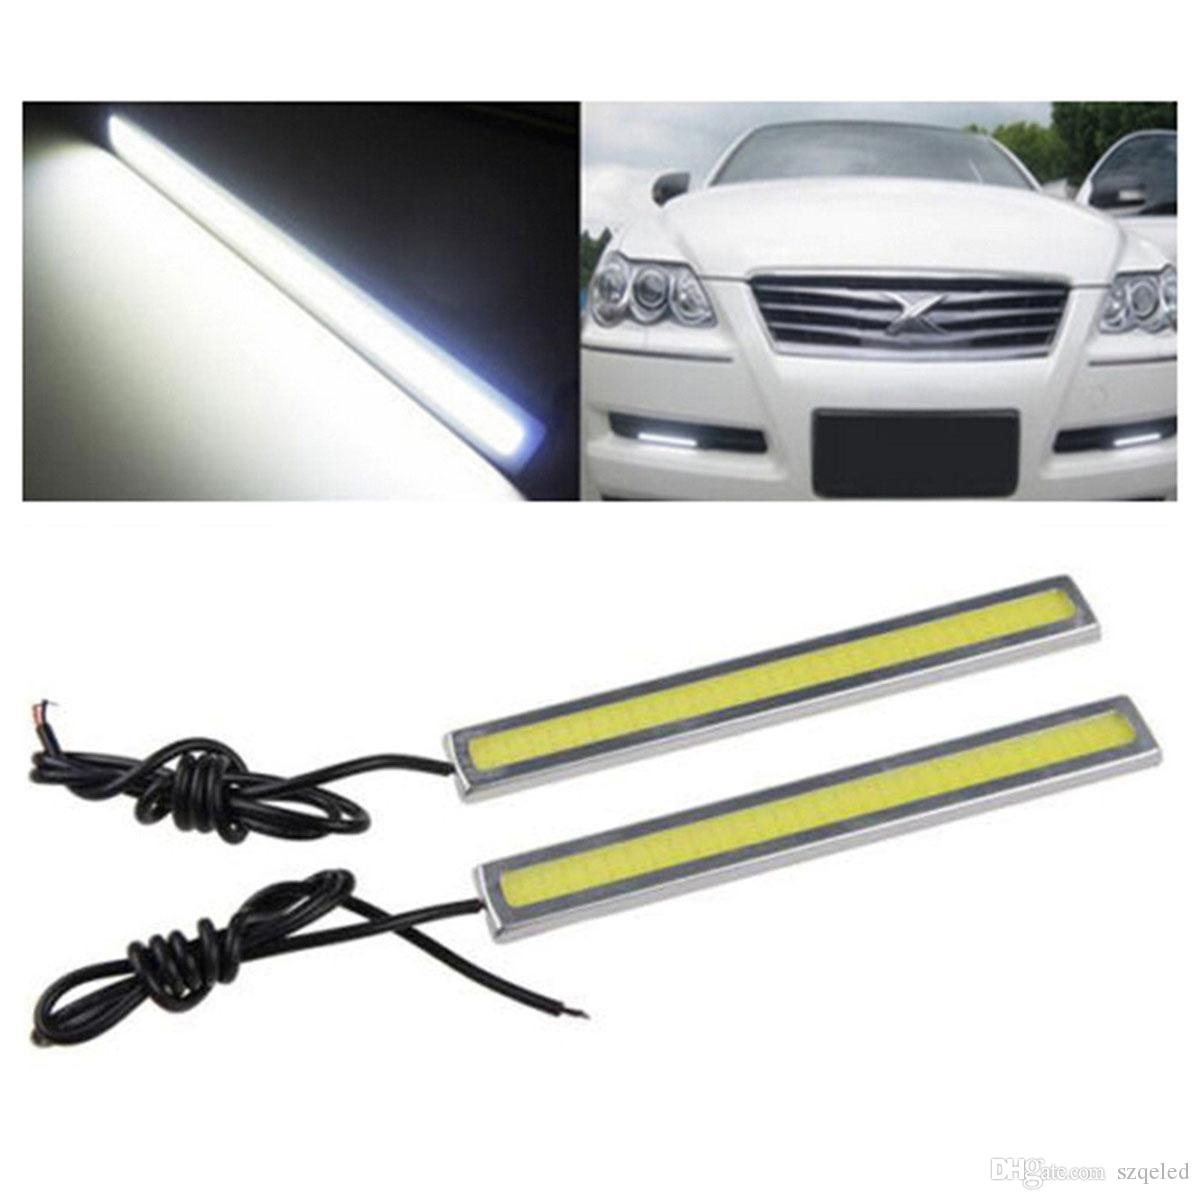 17 CM Super Bright COB Carro Branco Luzes LED Para DRL Fog Driving Lamp 12 V Para Universal Car Branco / Branco Fresco / Azul